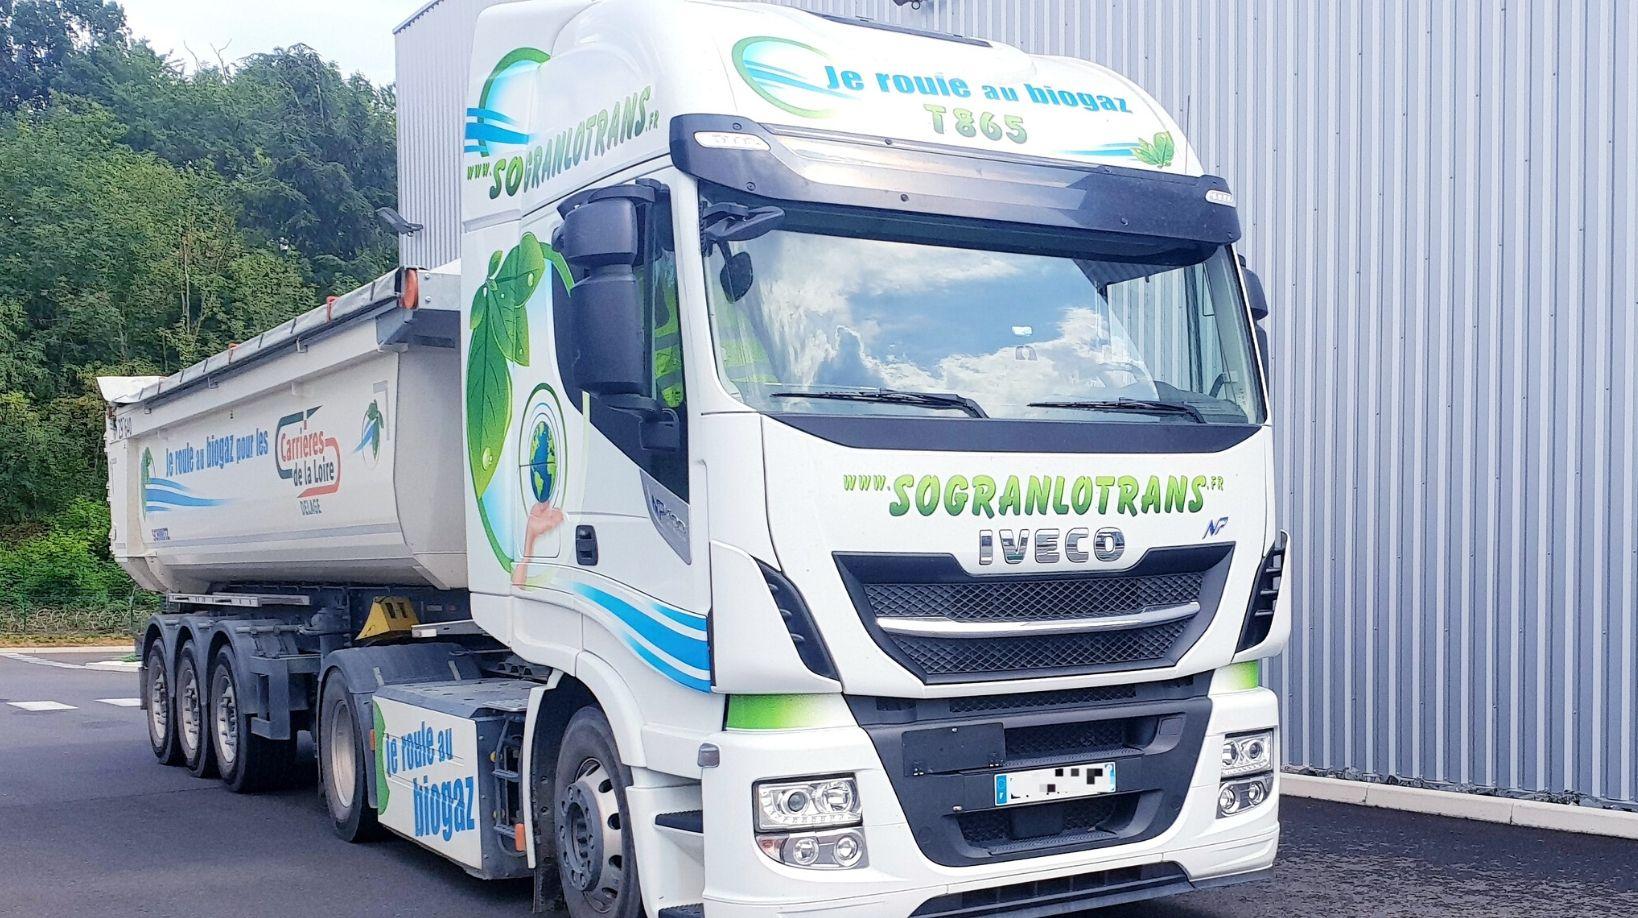 Sogranlotrans ecologique camion bio gaz v2